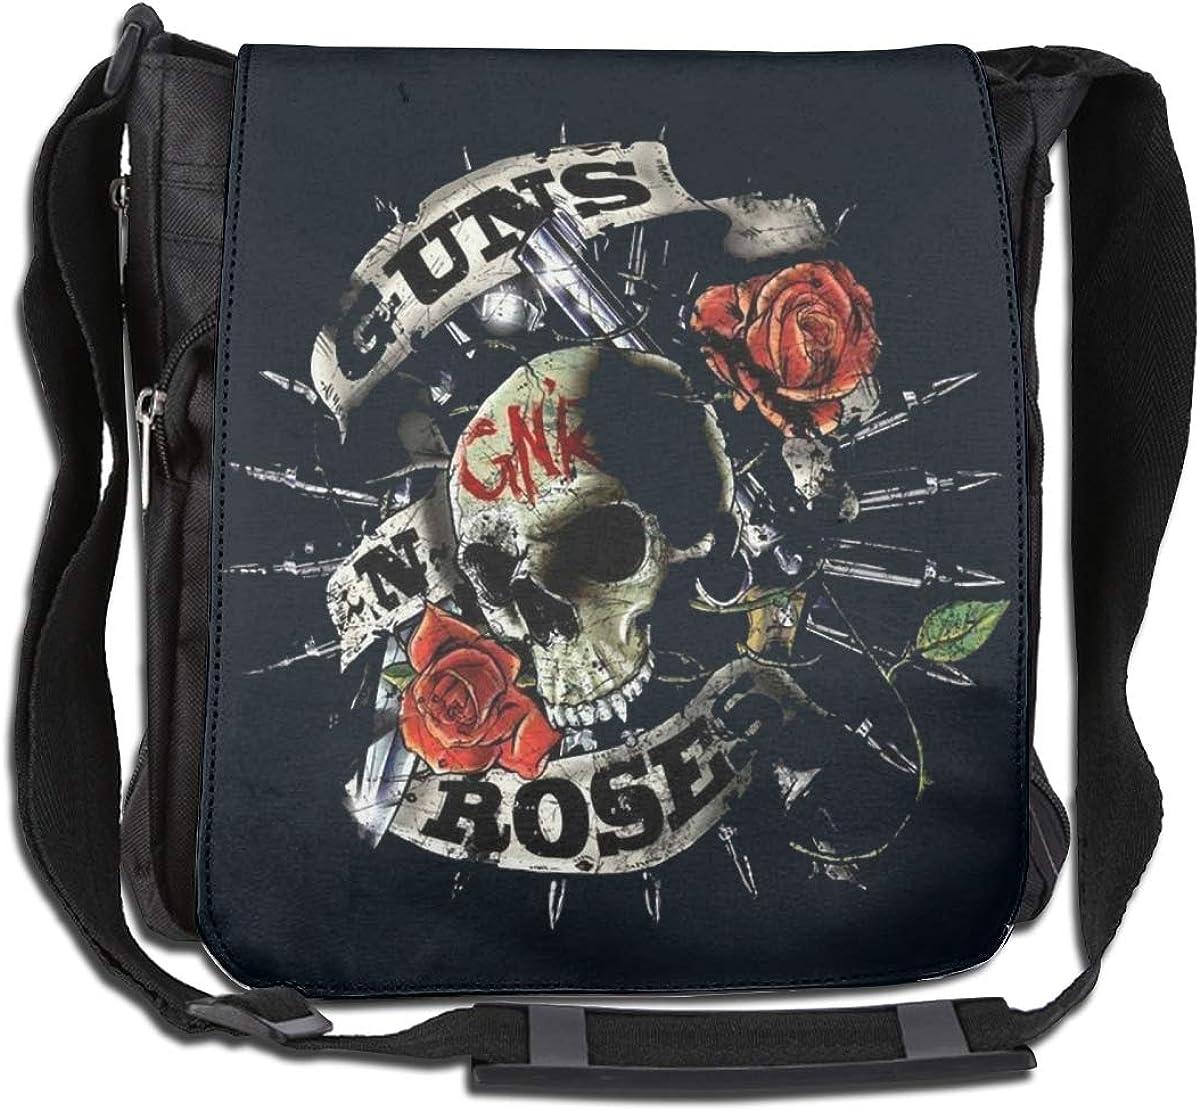 Skull Guns N Roses Rock Band Logo Crossbody Bag Shoulder Bags Backpack College Bookbag Travel Outdoor Daypack For Women Men